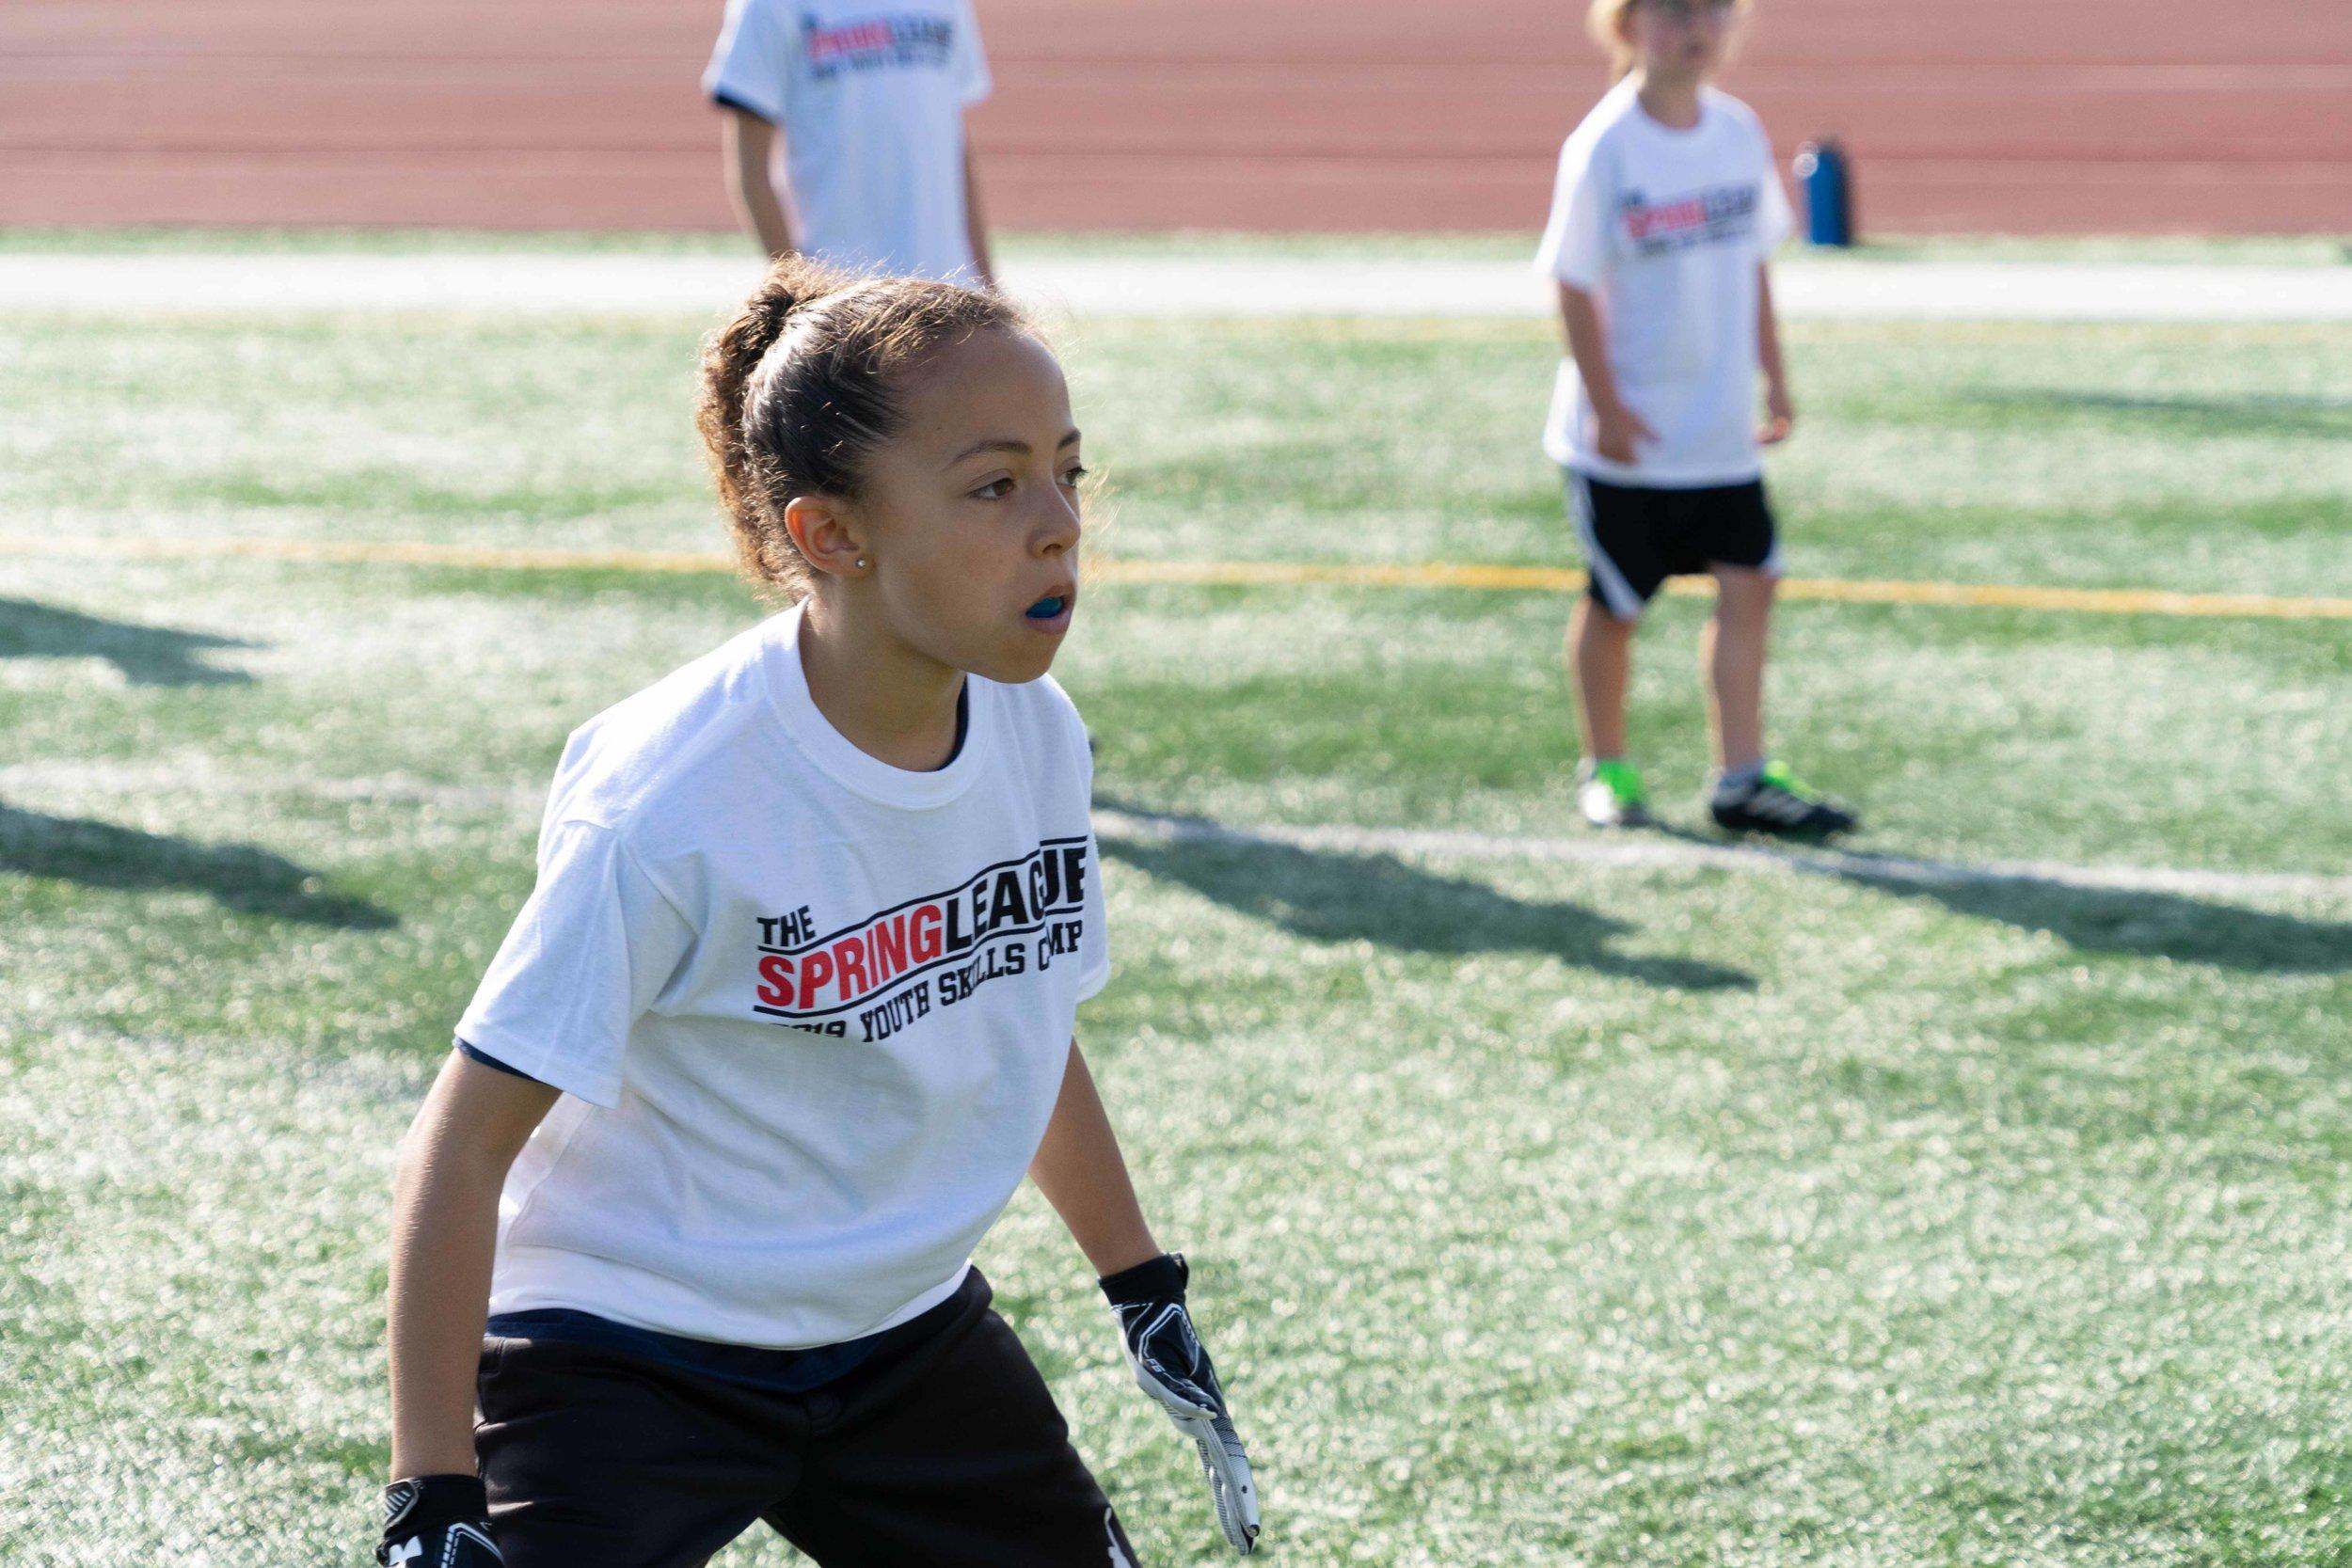 The Spring League Kids Skills Camp-6.jpg